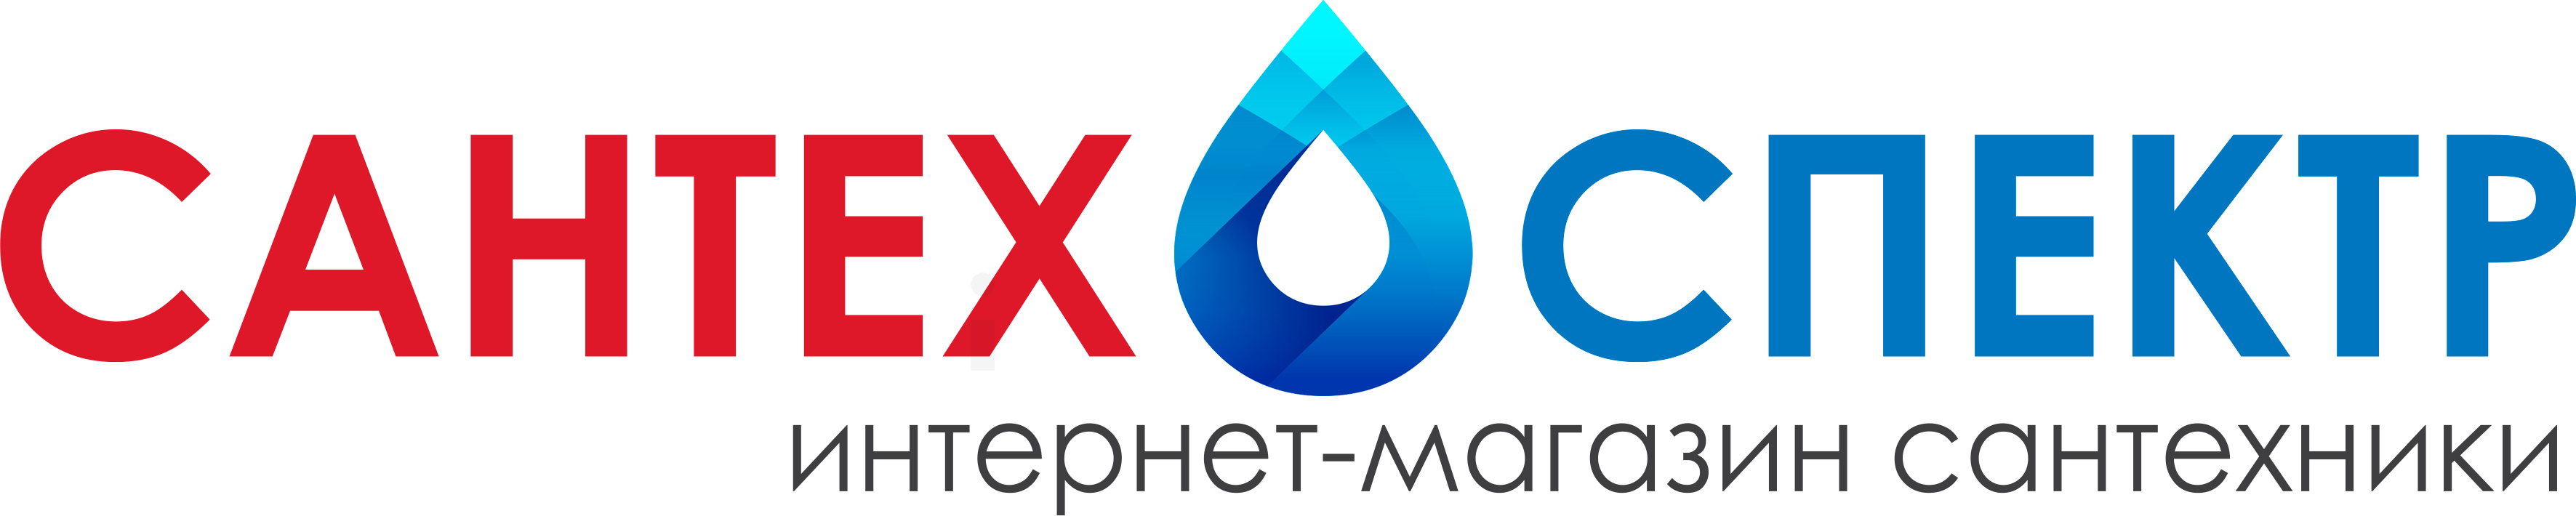 "Интернет-магазин сантехники ""СантехСпектр"""